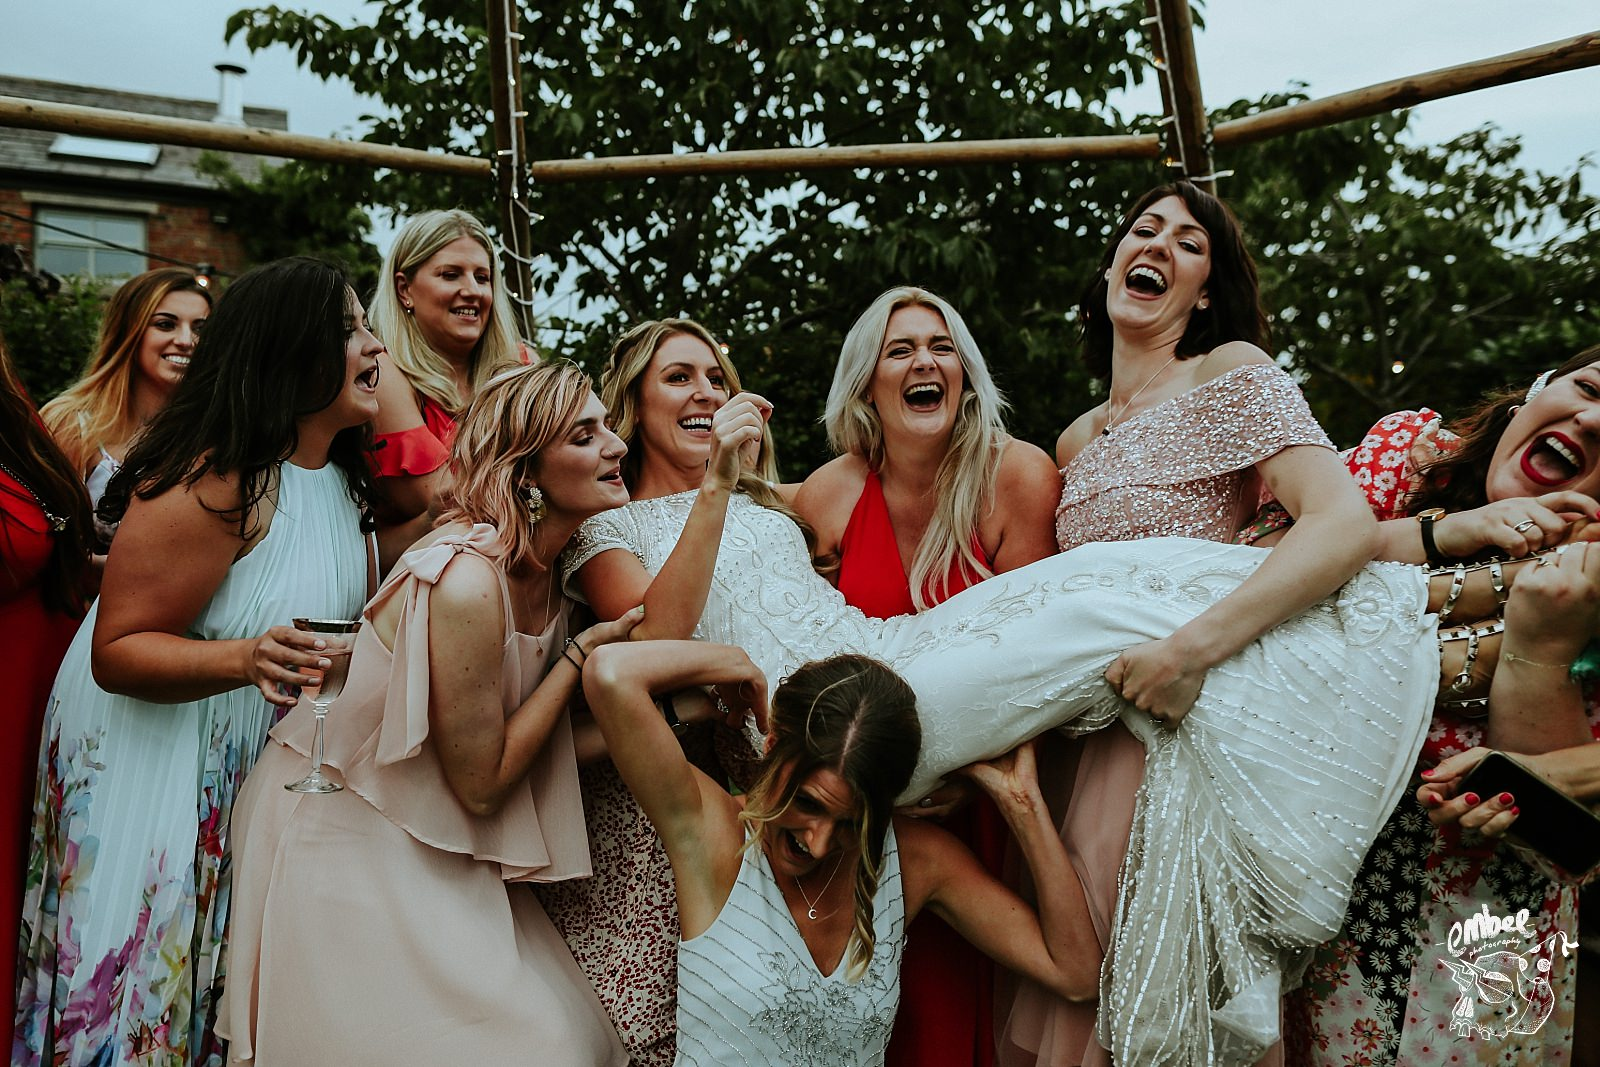 friends of bride having fun